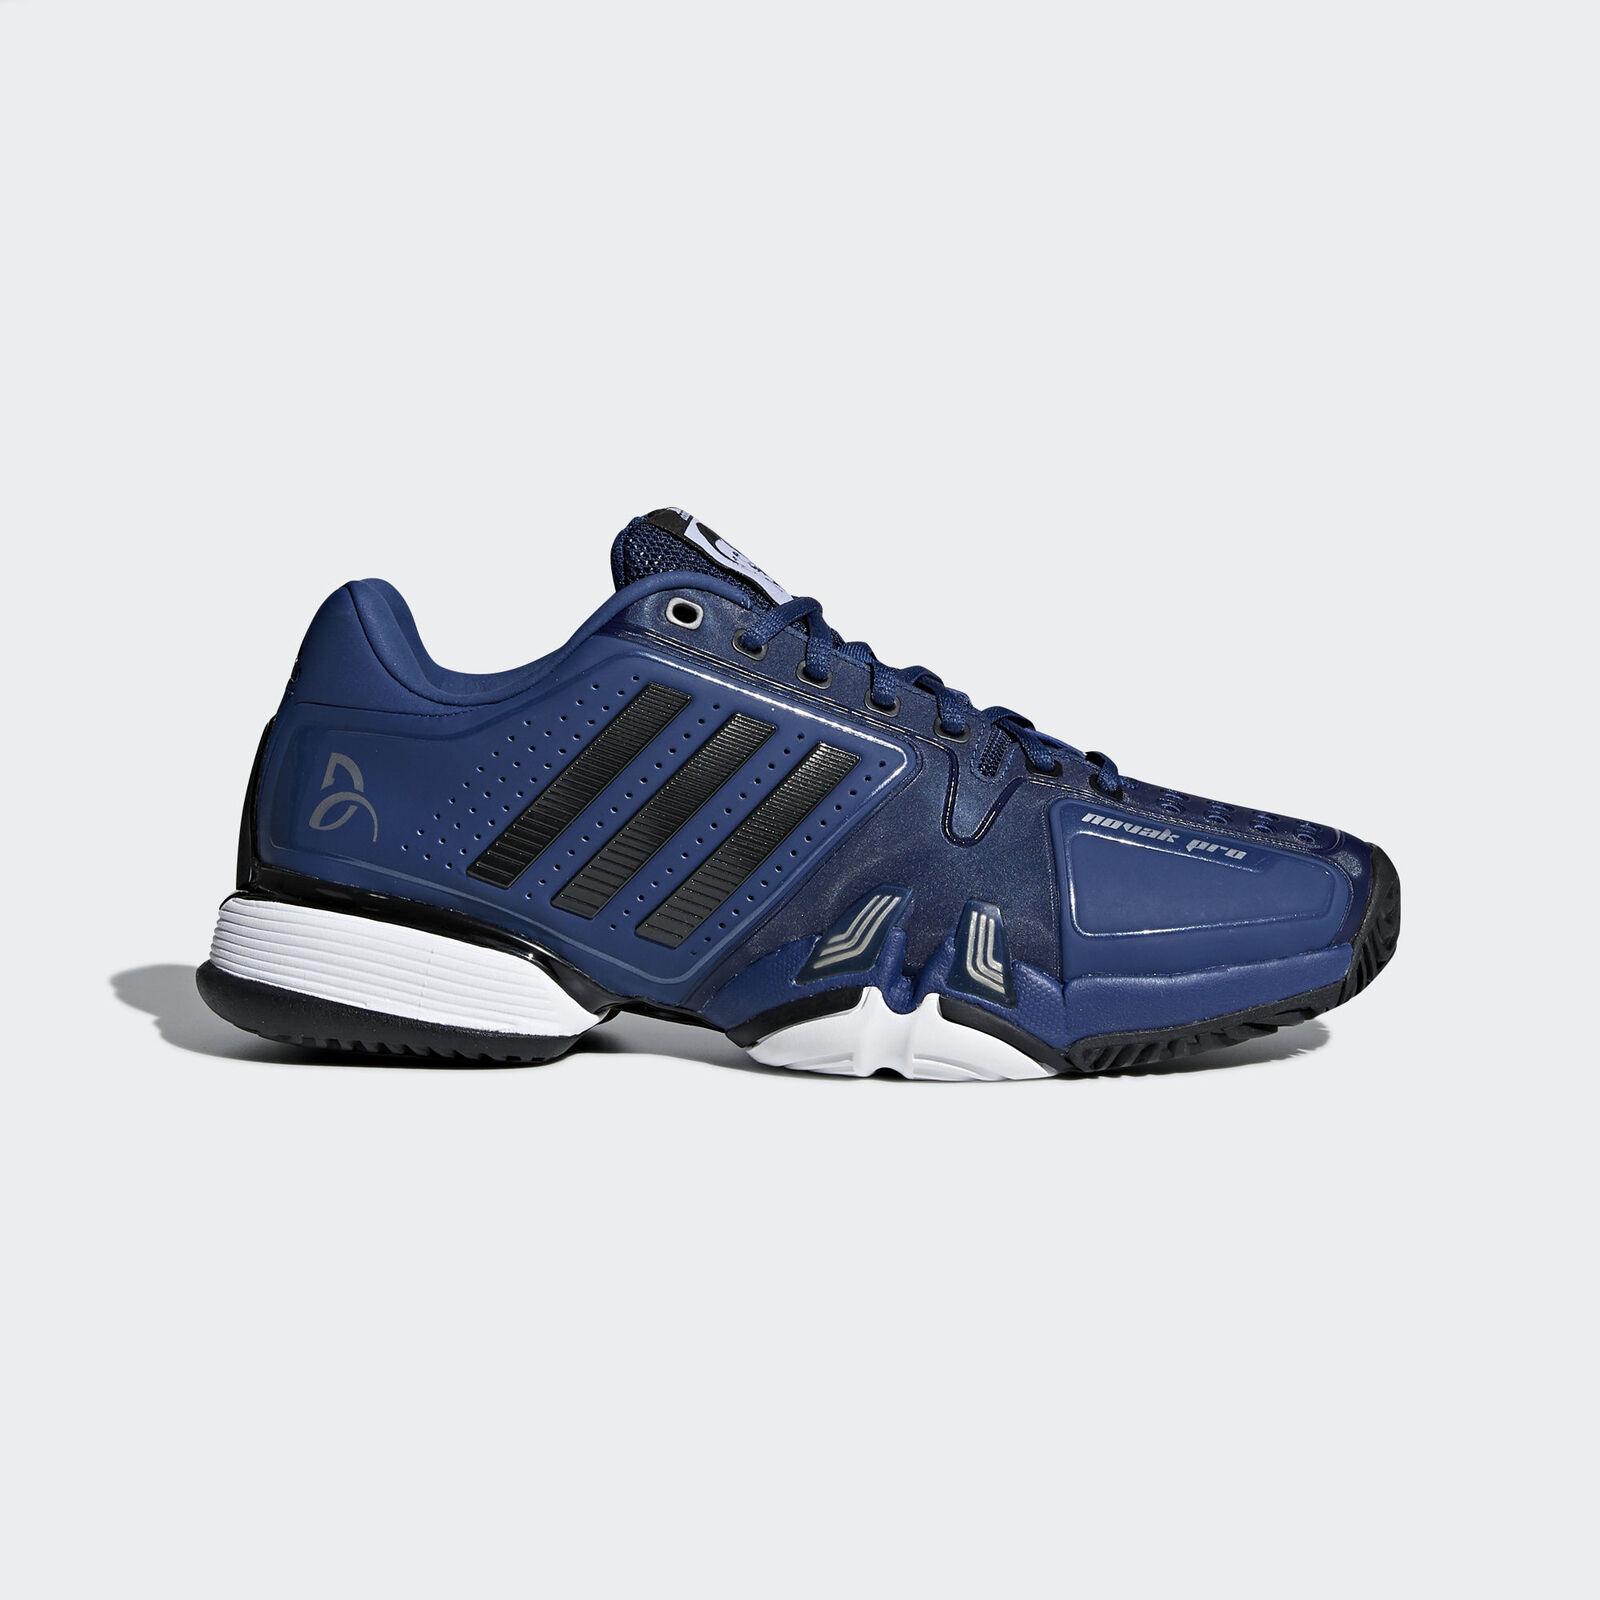 Adidas Novak Pro Price reduction Men Tennis Shoes Novak Djokovic White/Red-Silver